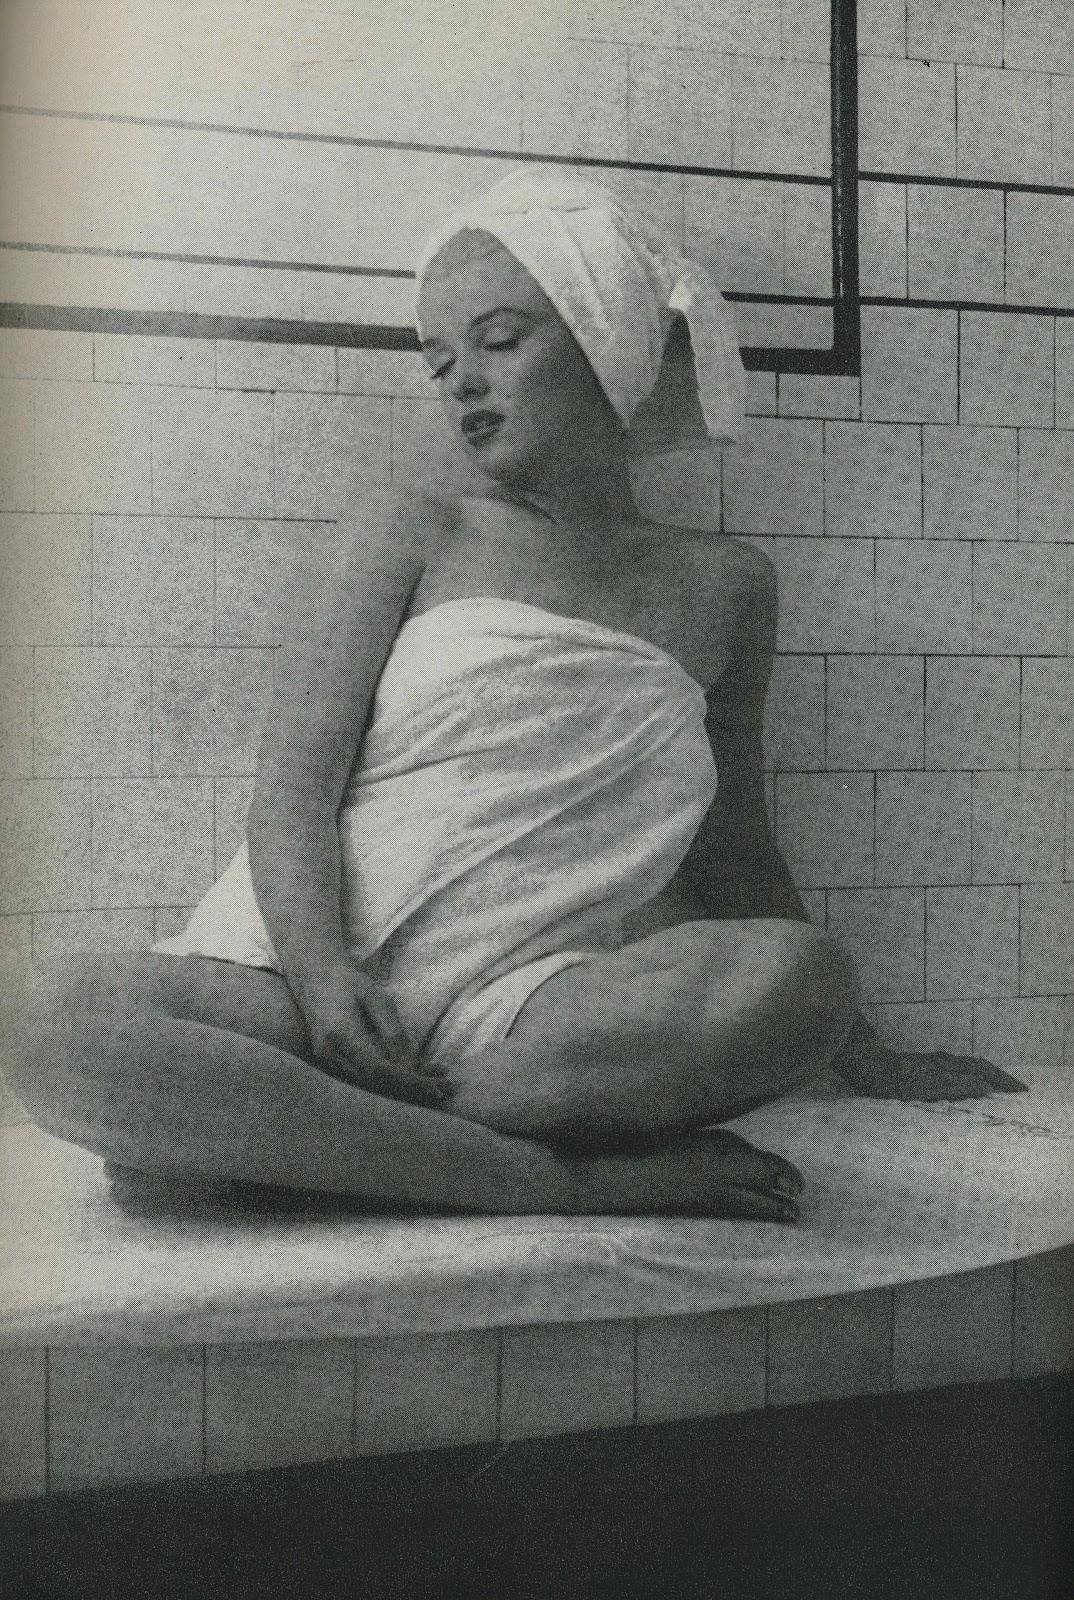 vintage sauna porn